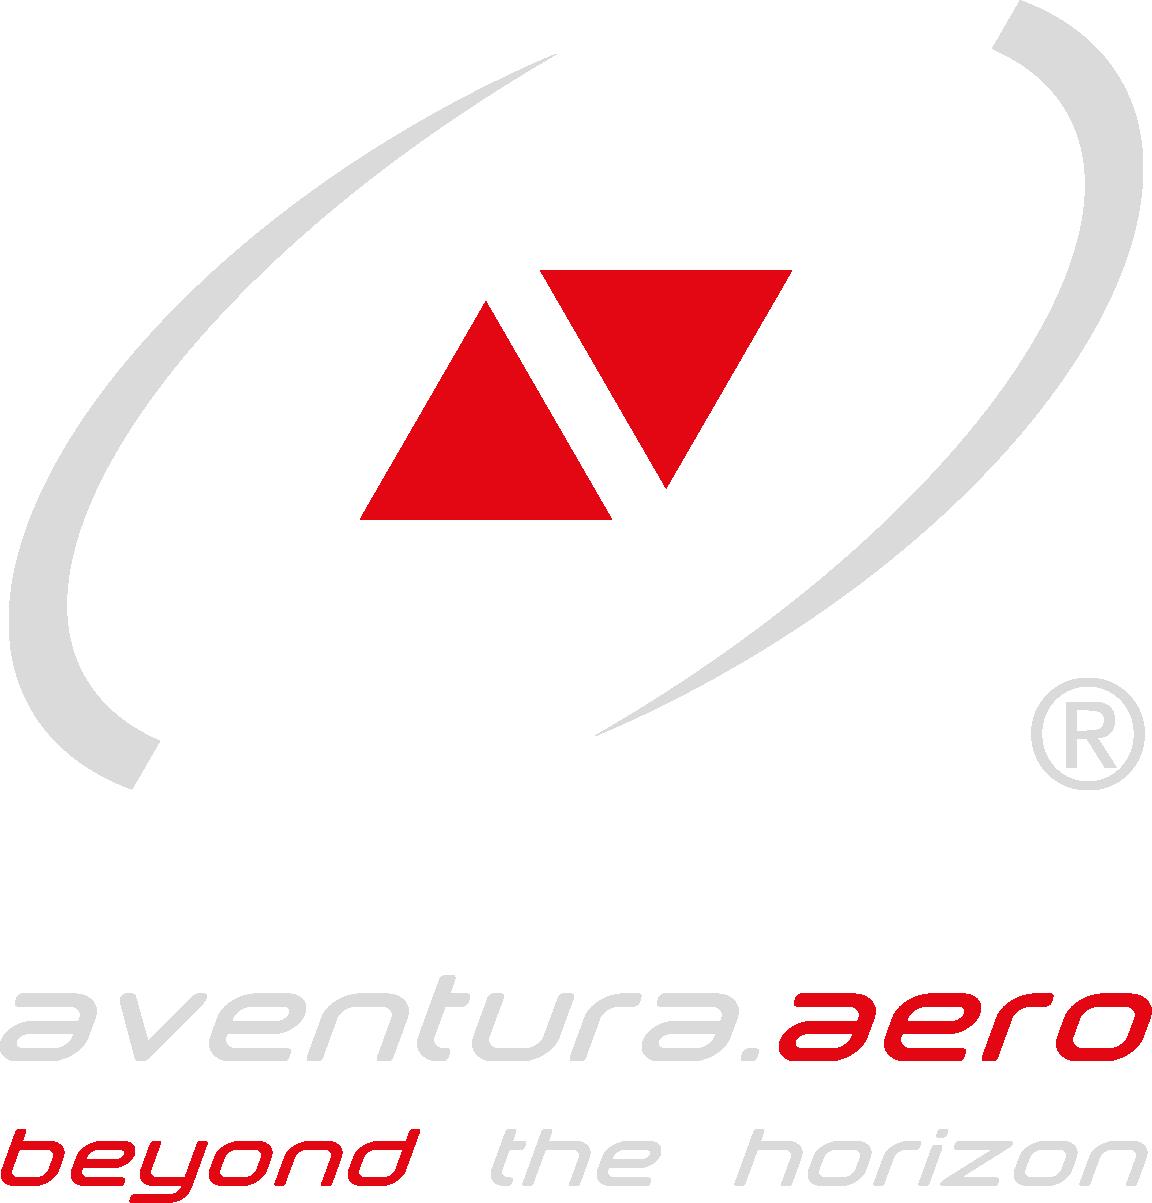 aventura aero